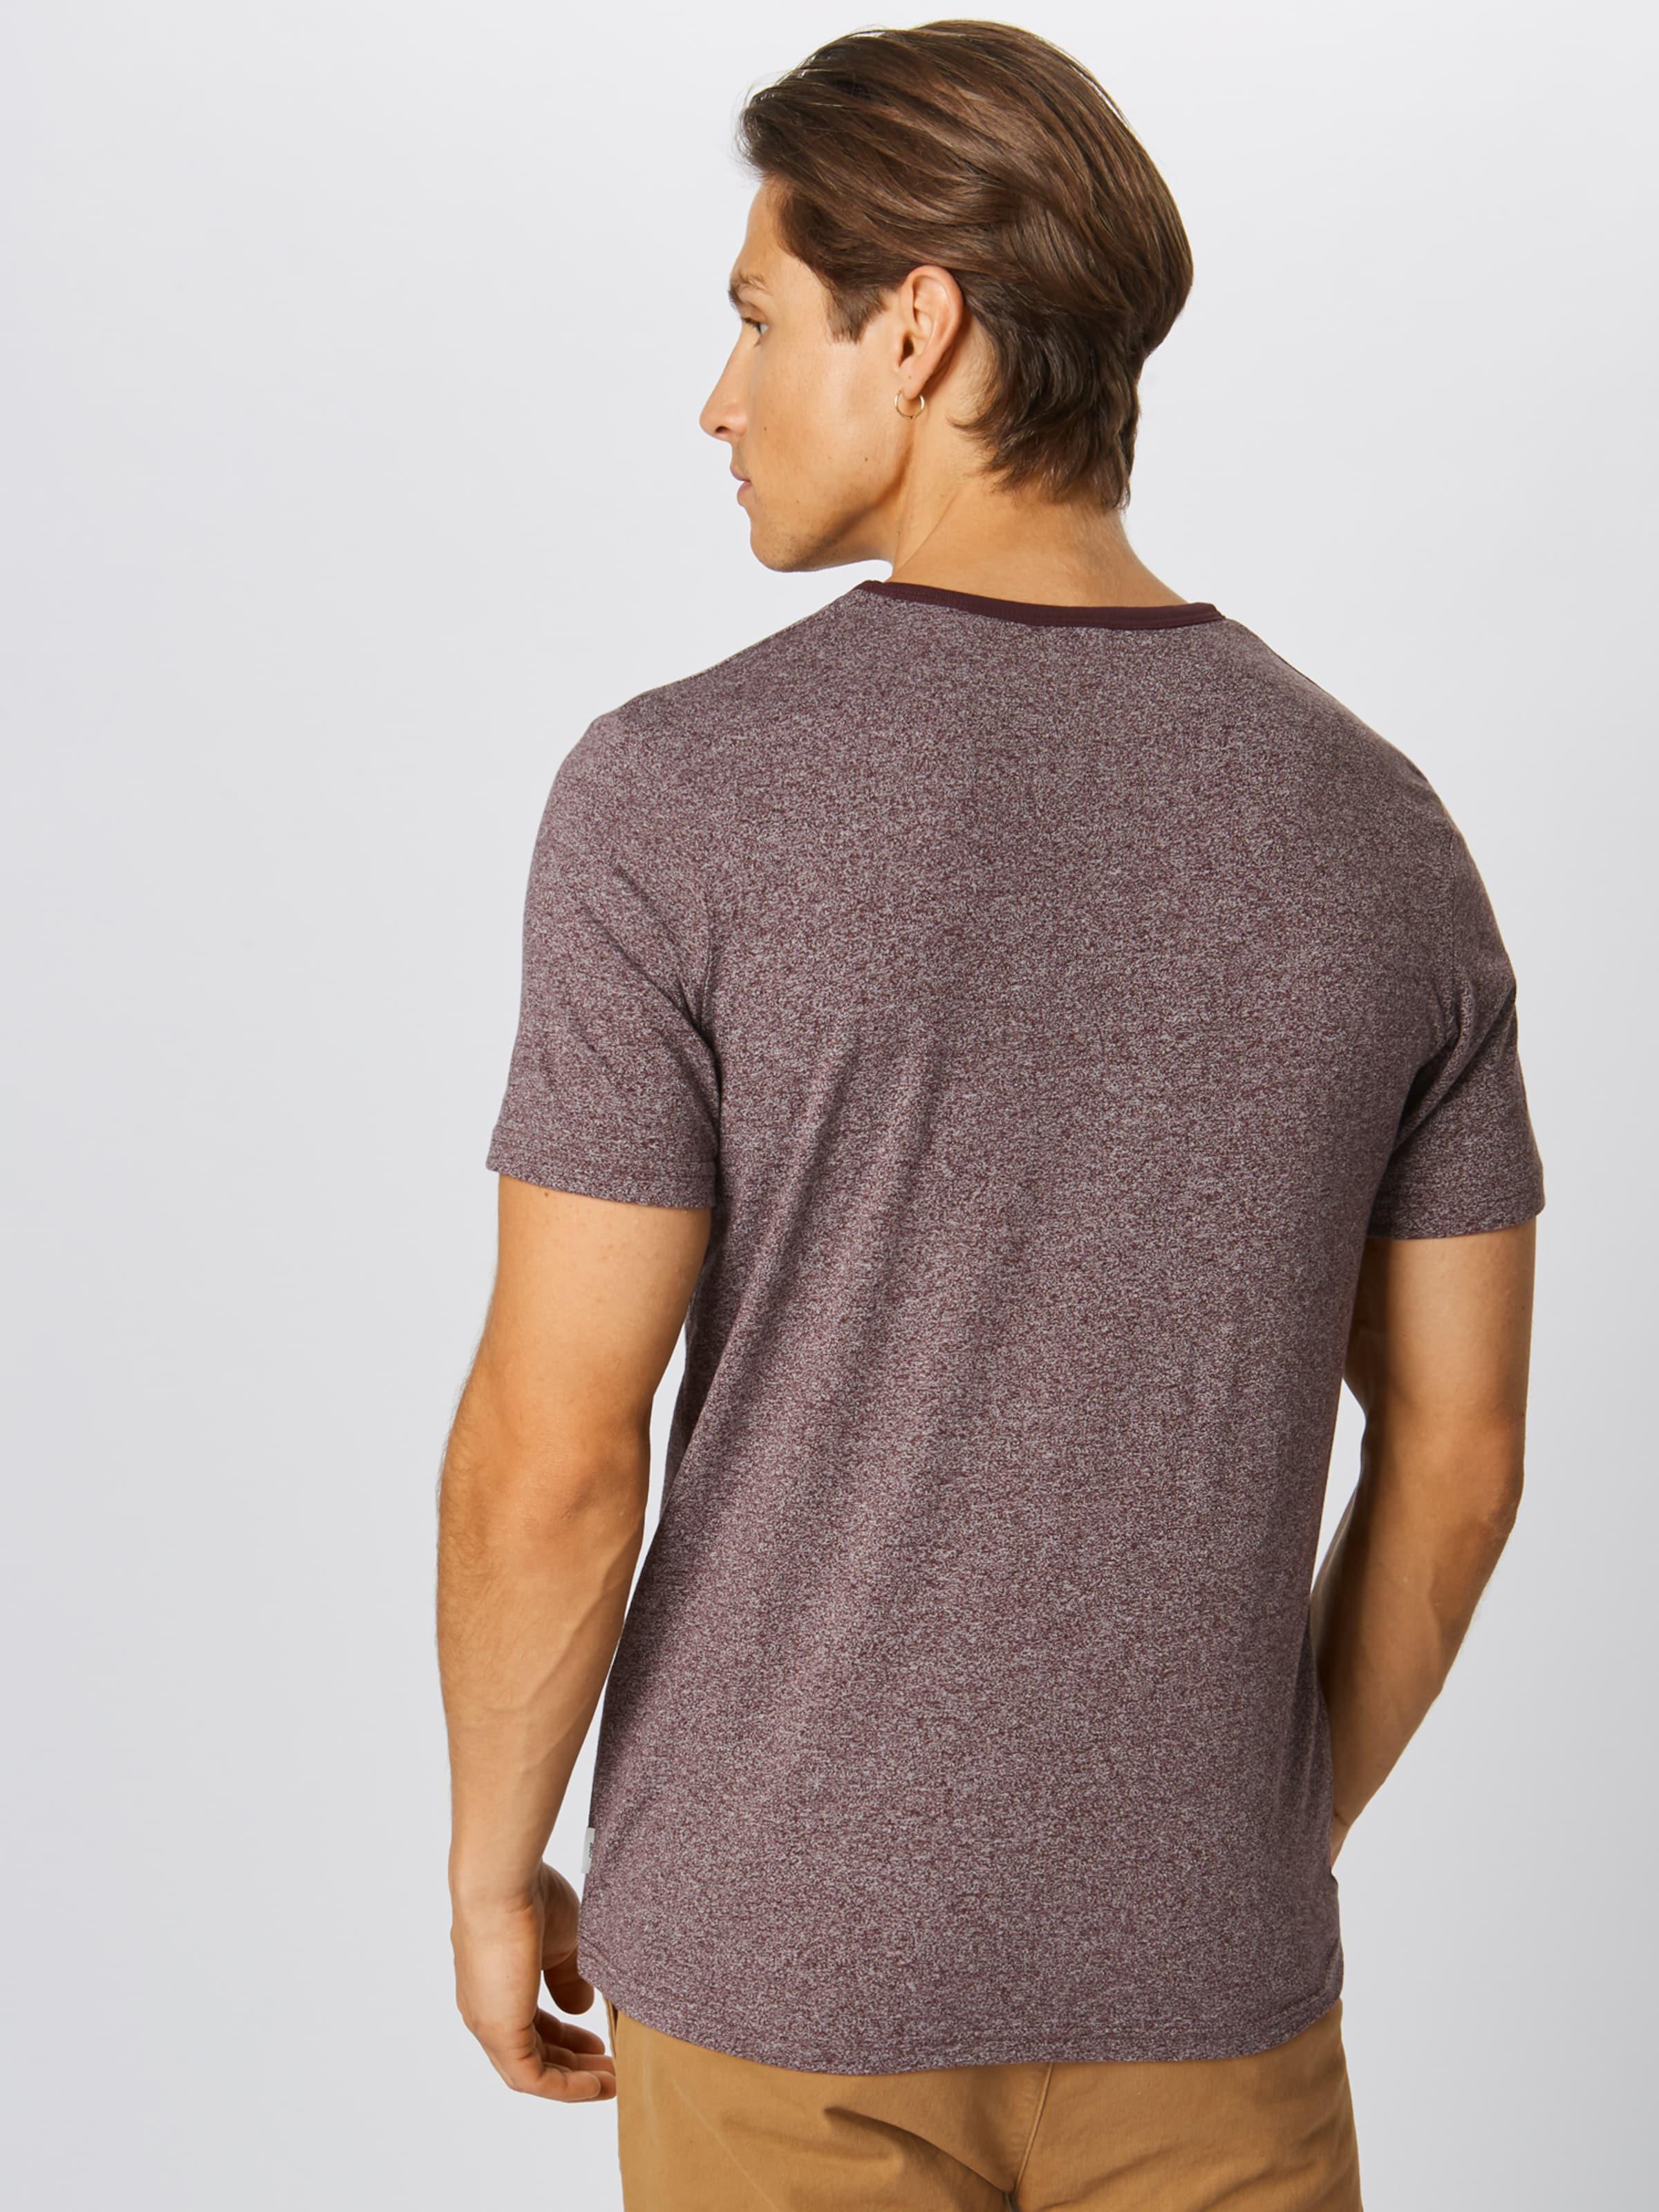 shirt Jackamp; Bleu 'jcomari' Jones T En YybfI7gvm6